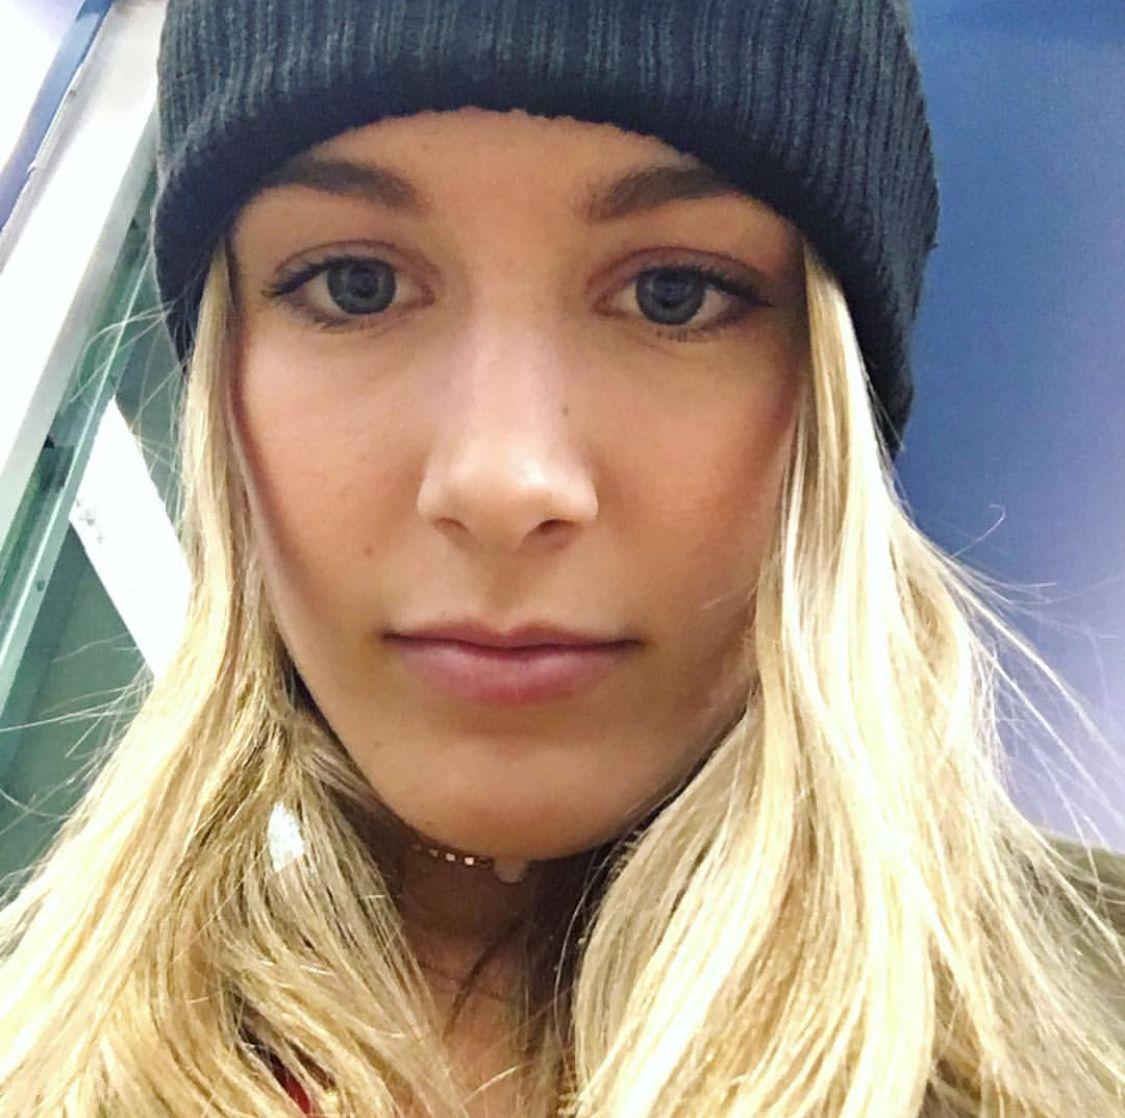 Selfie Gugenie Bouchard nude photos 2019